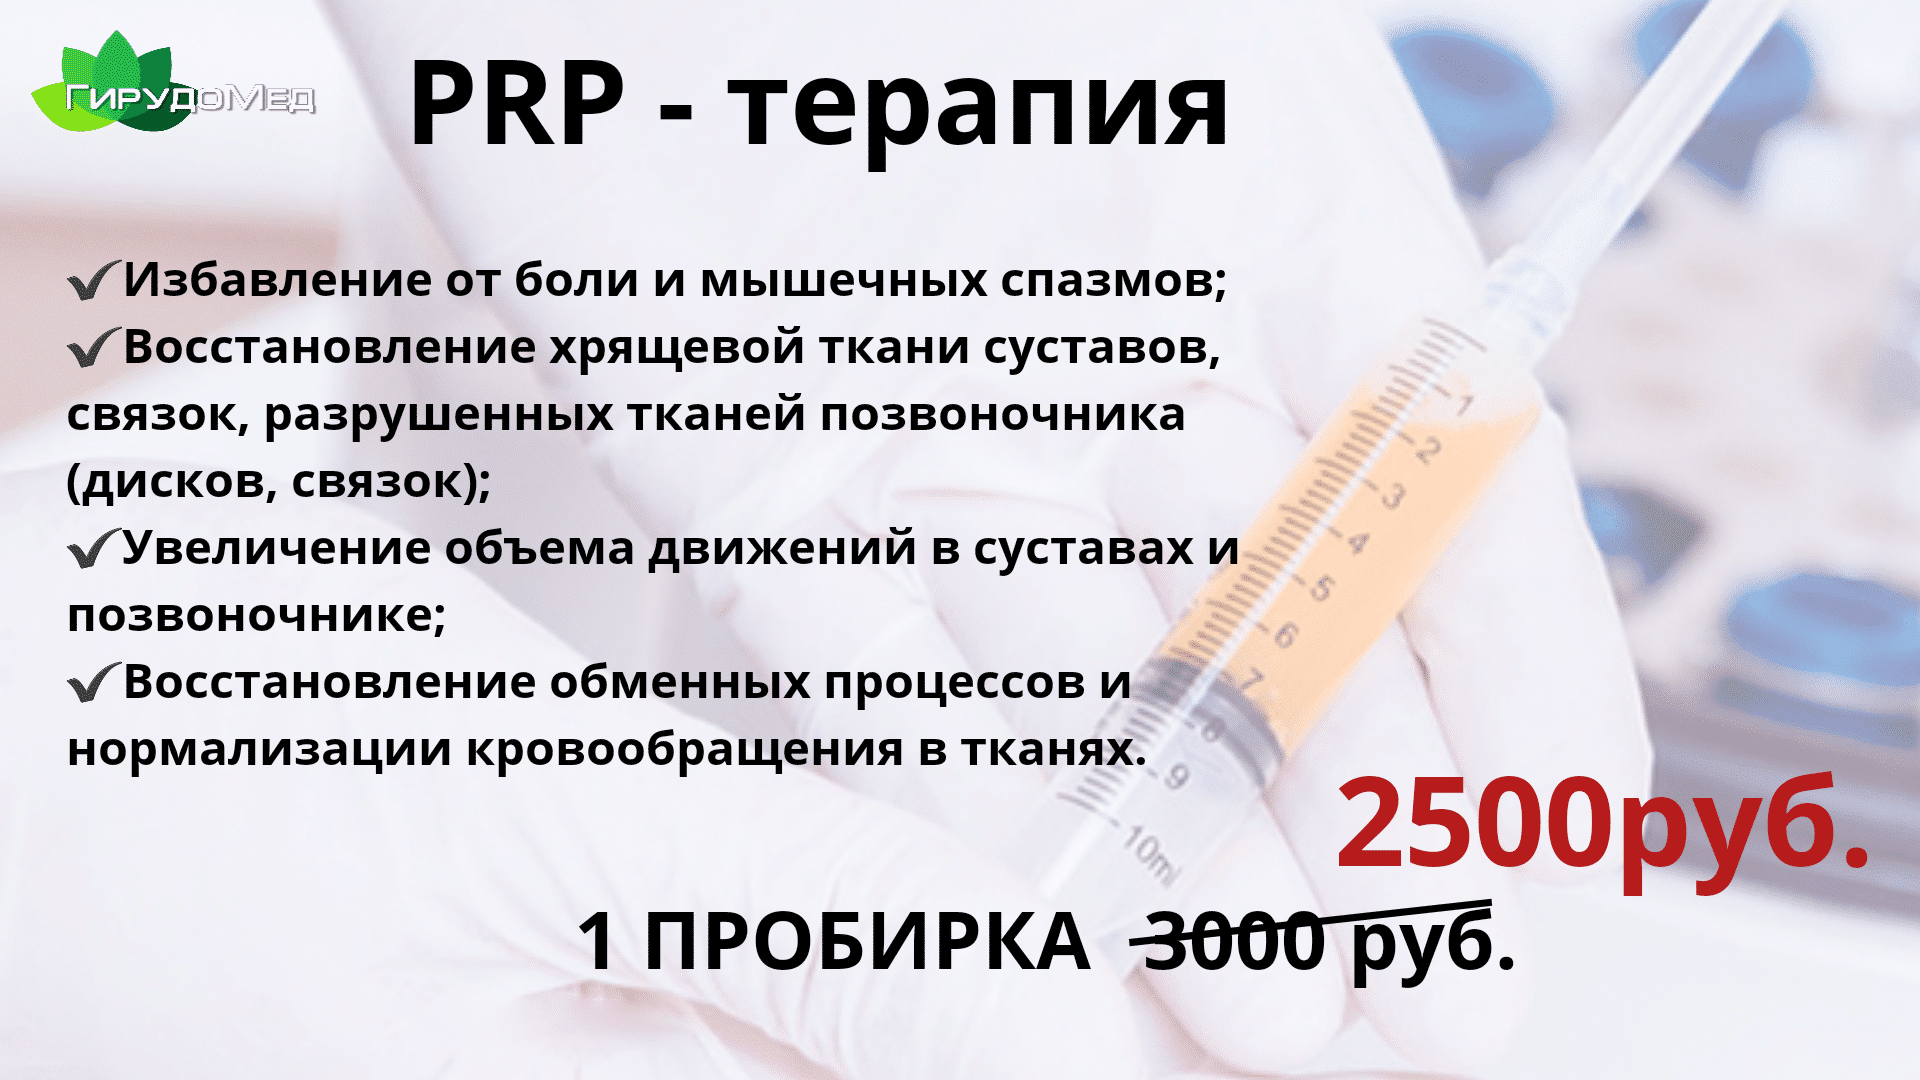 20200709_114055_0000 (1)